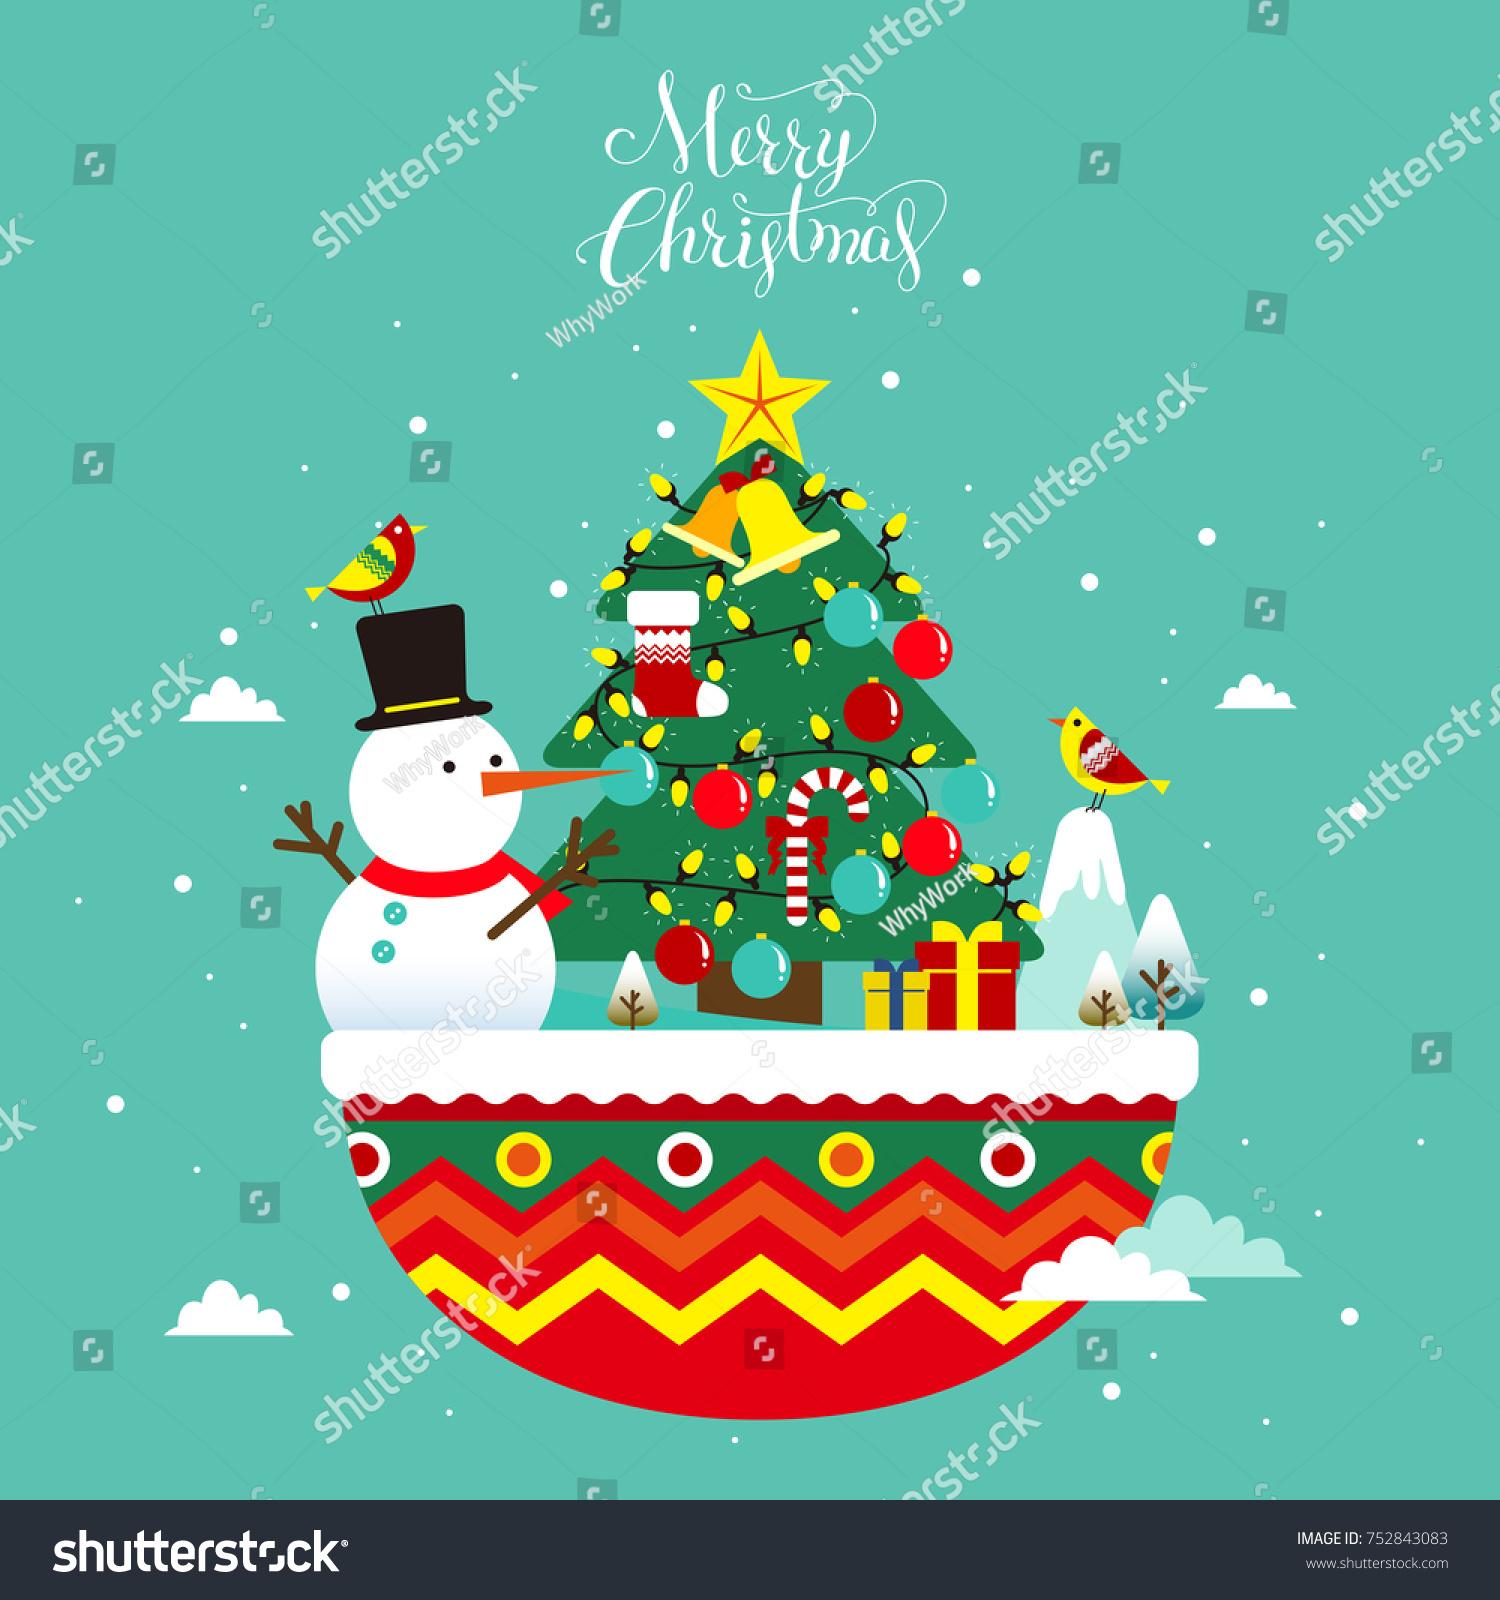 Flat style christmas greeting card design stock vector 752843083 flat style christmas greeting card design with christmas santa claus snowman and christmas tree kristyandbryce Choice Image